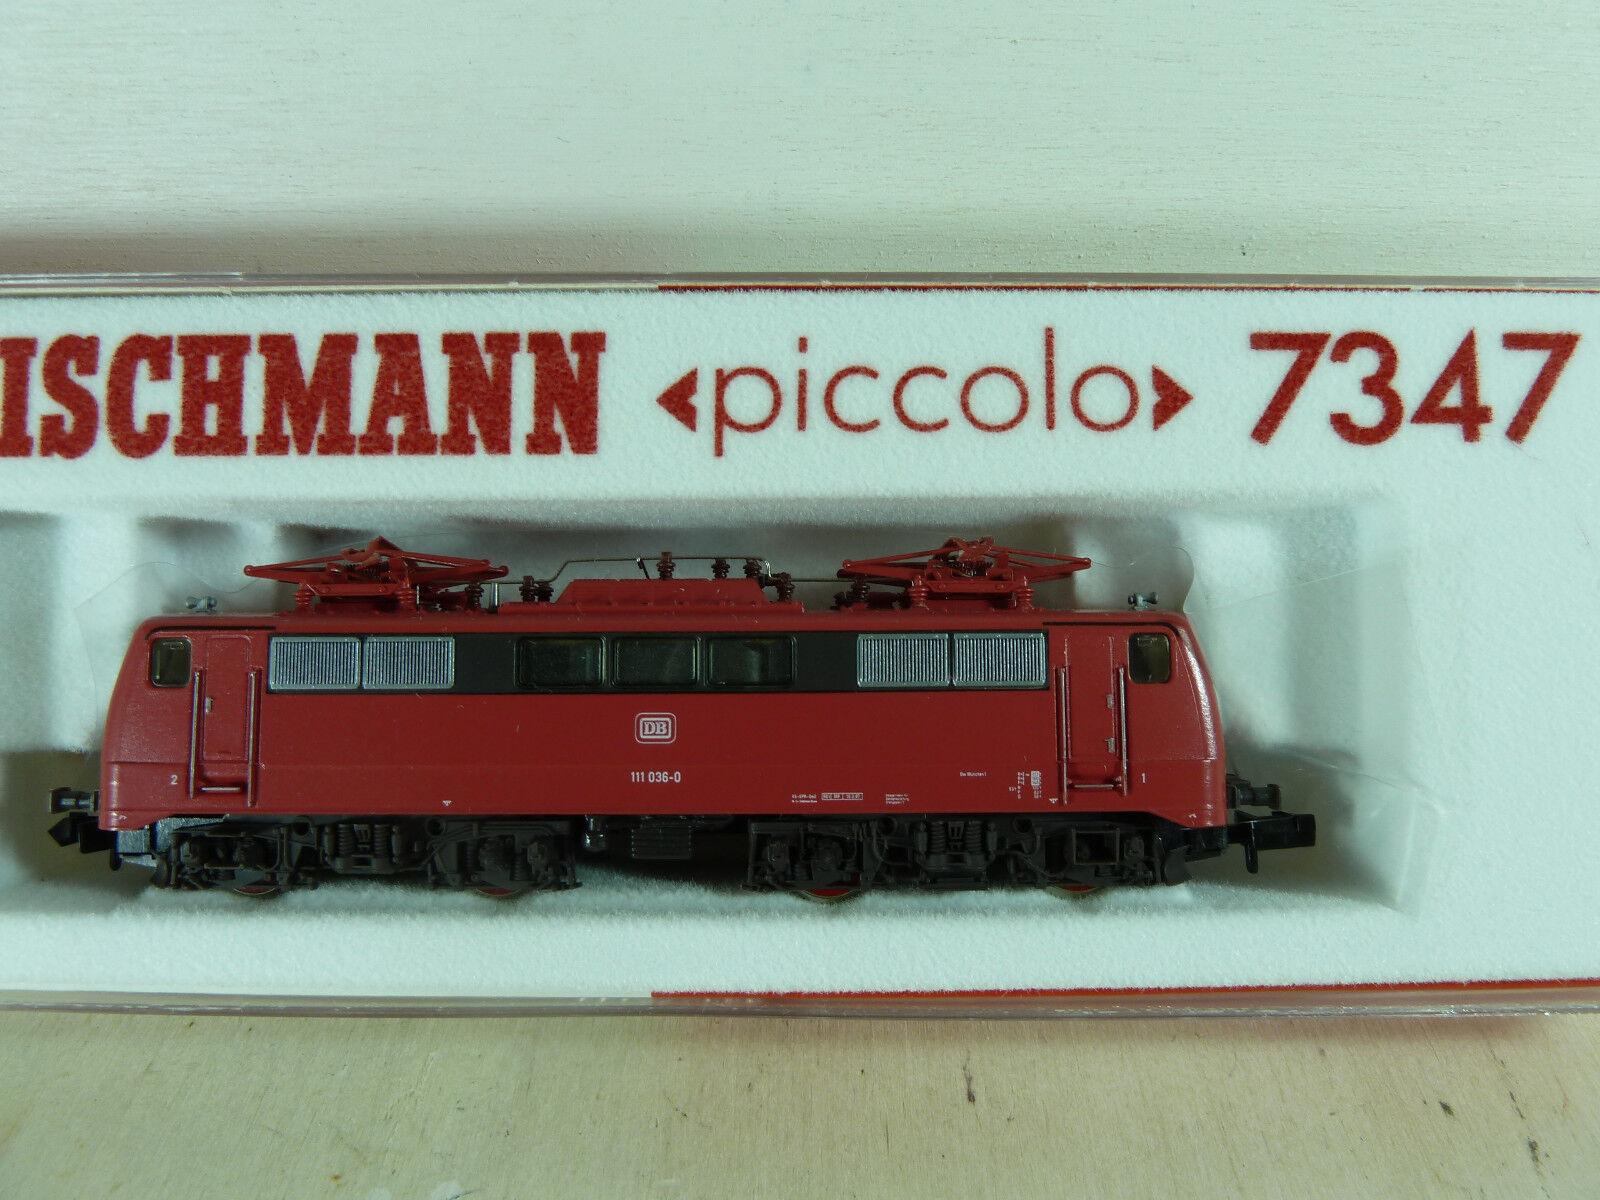 Ladenneu Fleischmann Spur N BR111 E-lLok 7347    Primäre Qualität